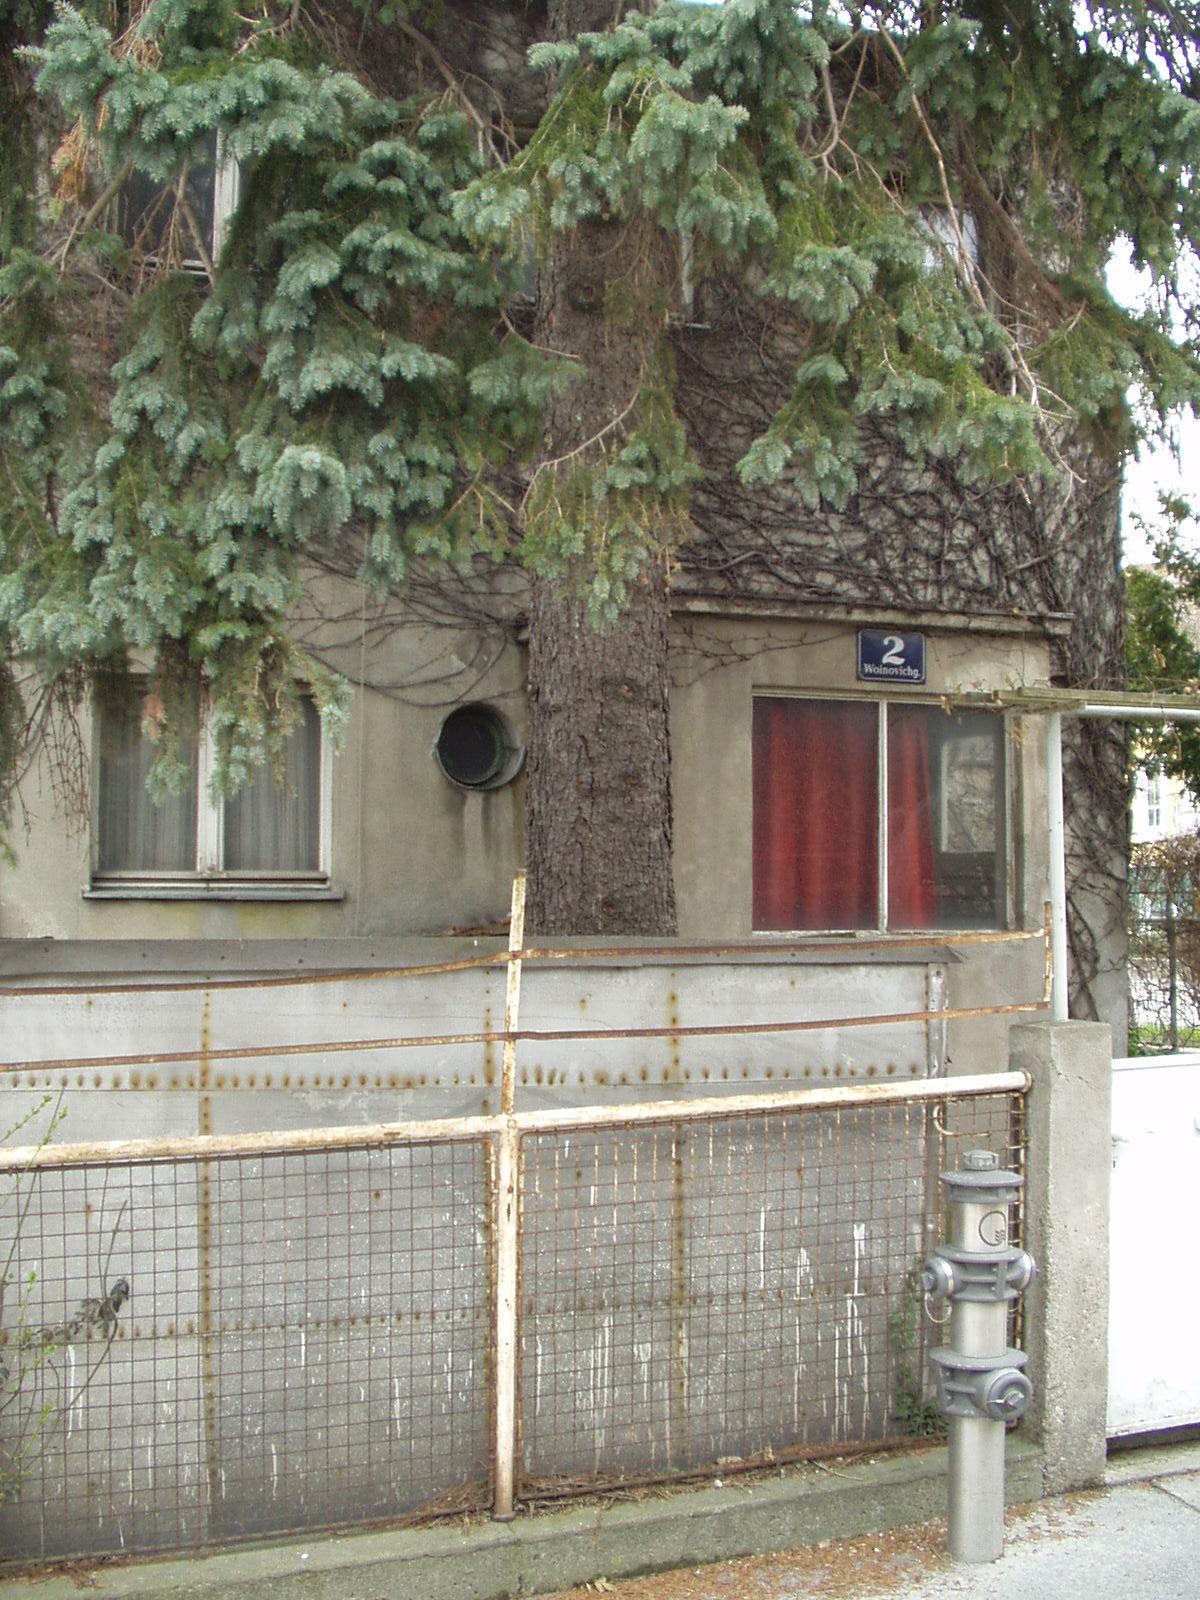 file margarete schuette lihotzky 1931 1932 a1130 wien woinovichgasse 2. Black Bedroom Furniture Sets. Home Design Ideas